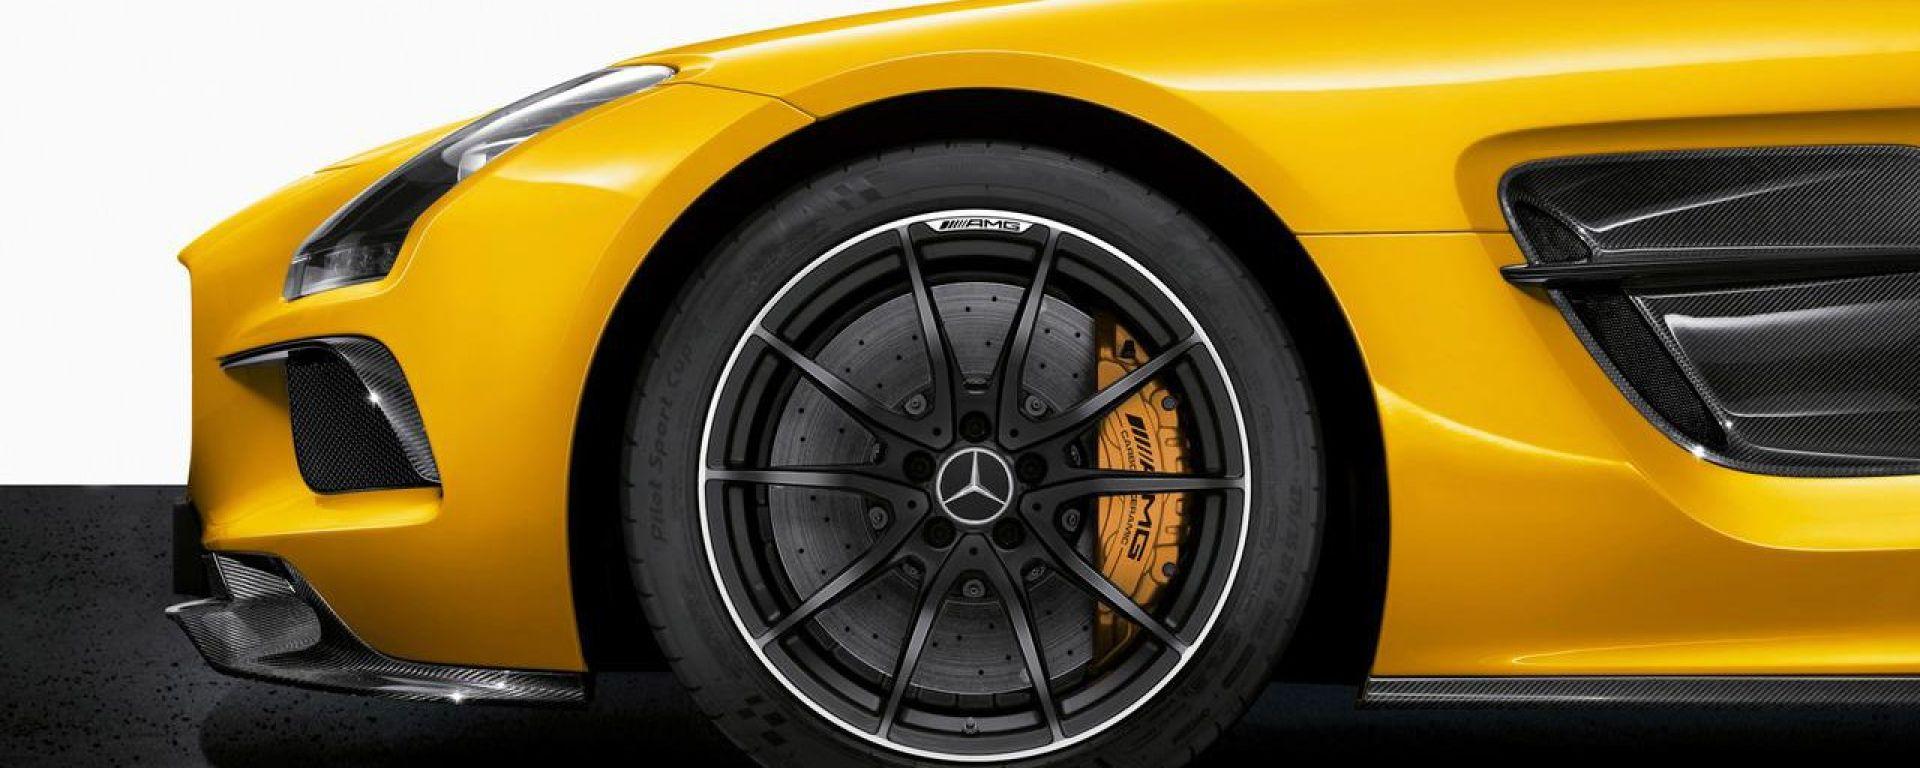 Mercedes SLS AMG Black Series 2014, c'è anche un video